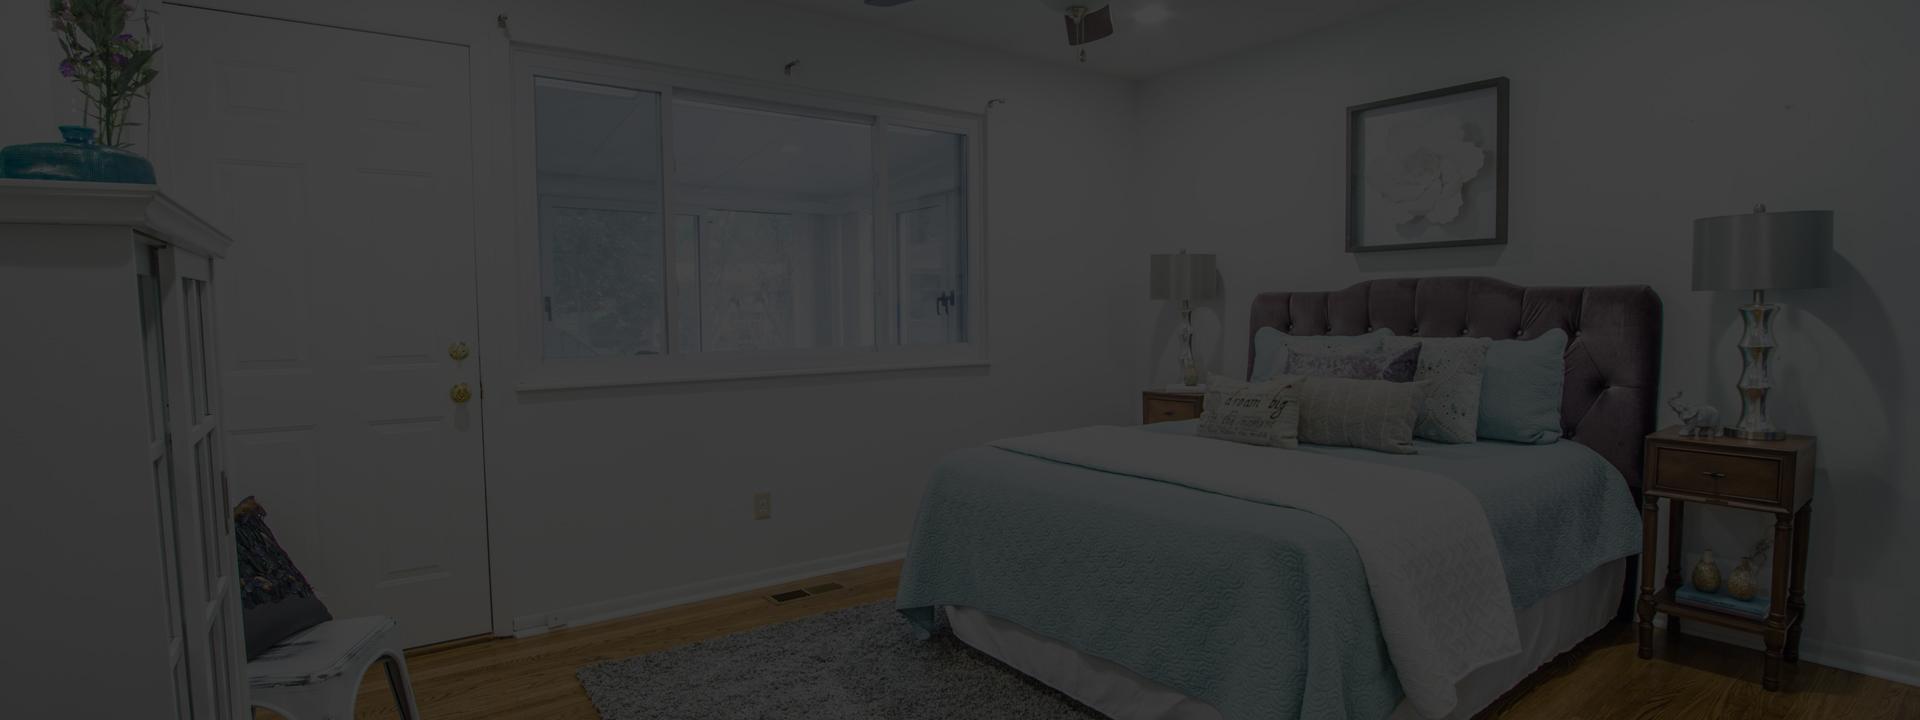 Airbnb Management & Hosting